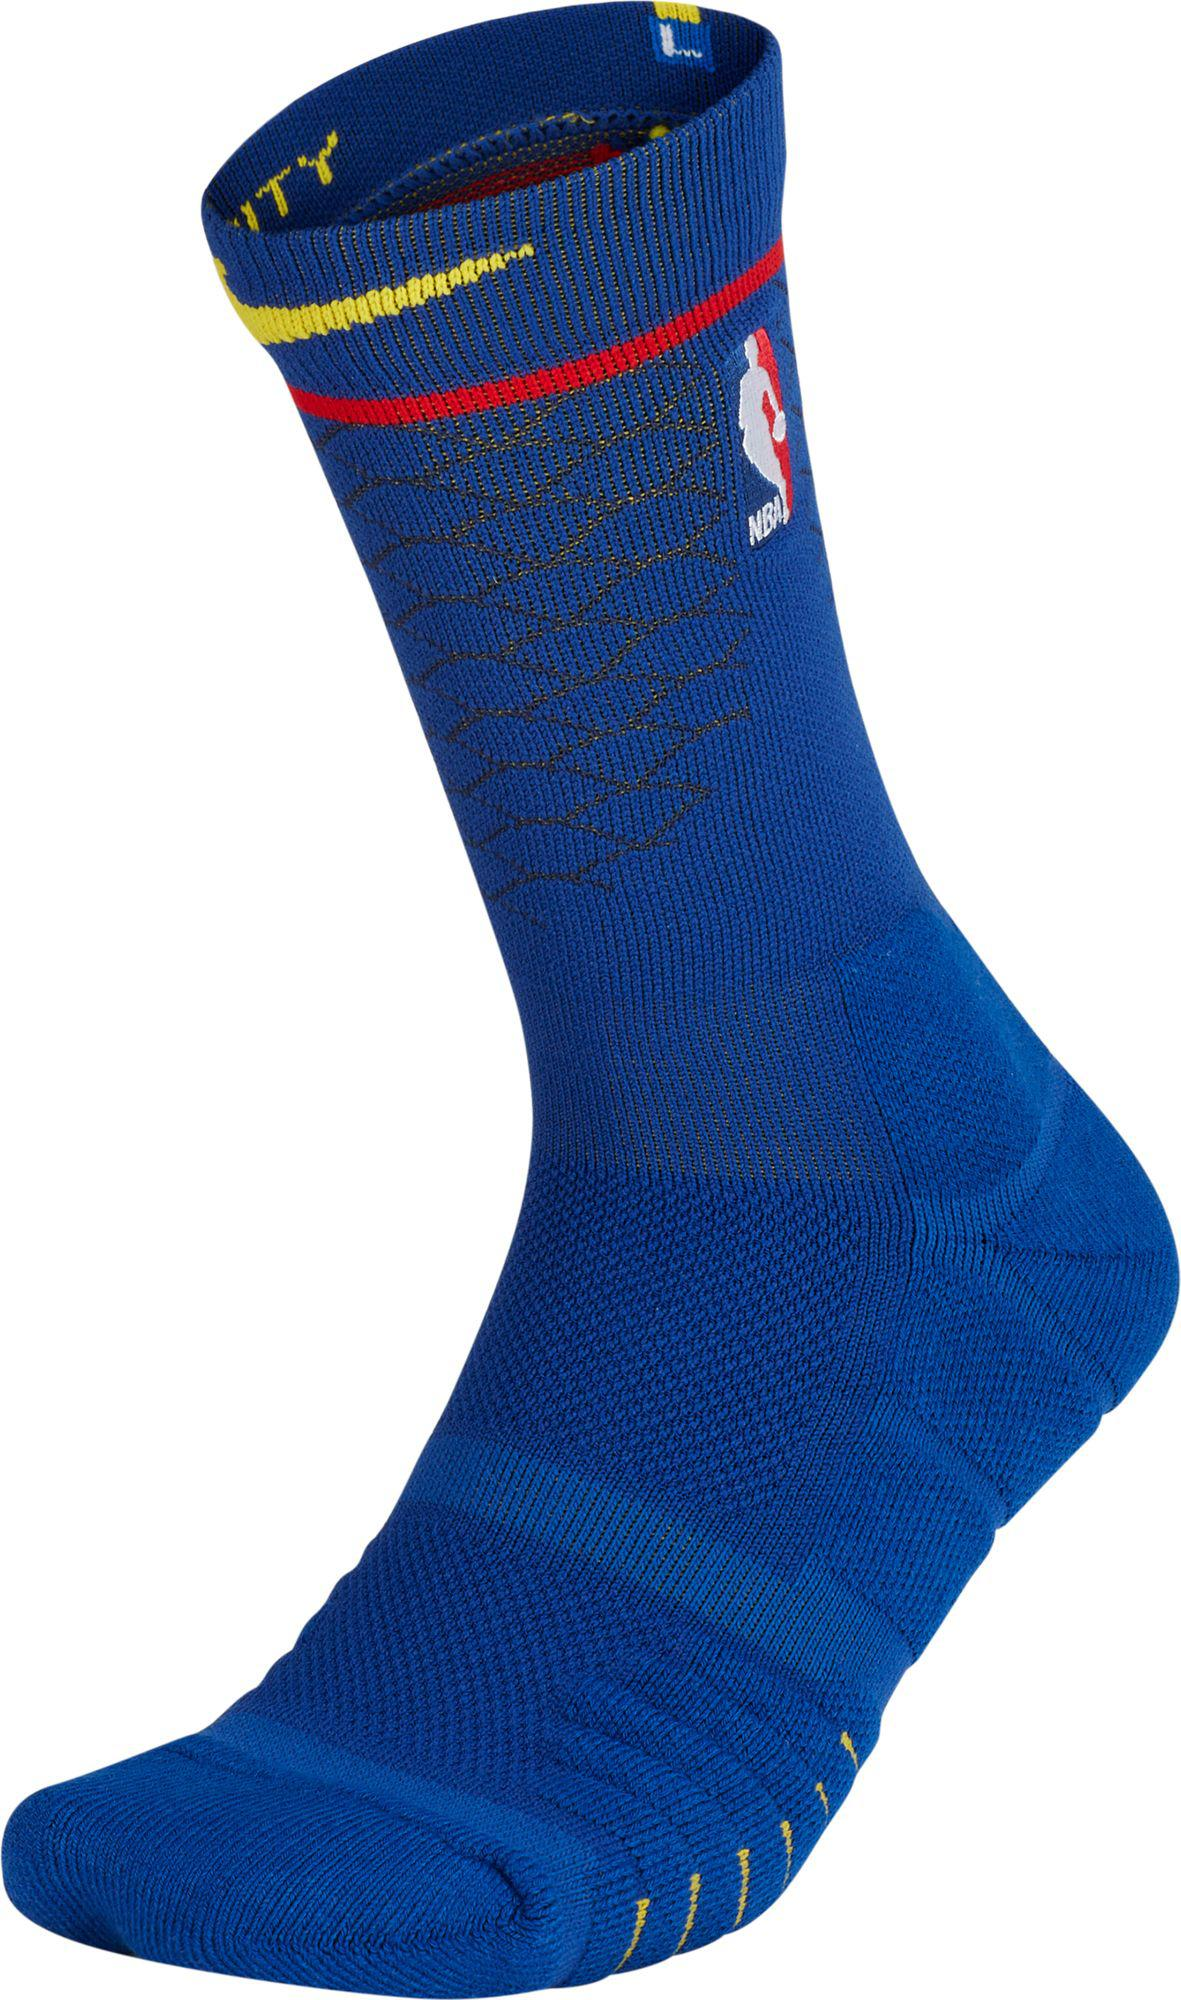 c140a8ef4 Nike - Blue Golden State Warriors City Edition Elite Quick Nba Crew Socks  for Men -. View fullscreen